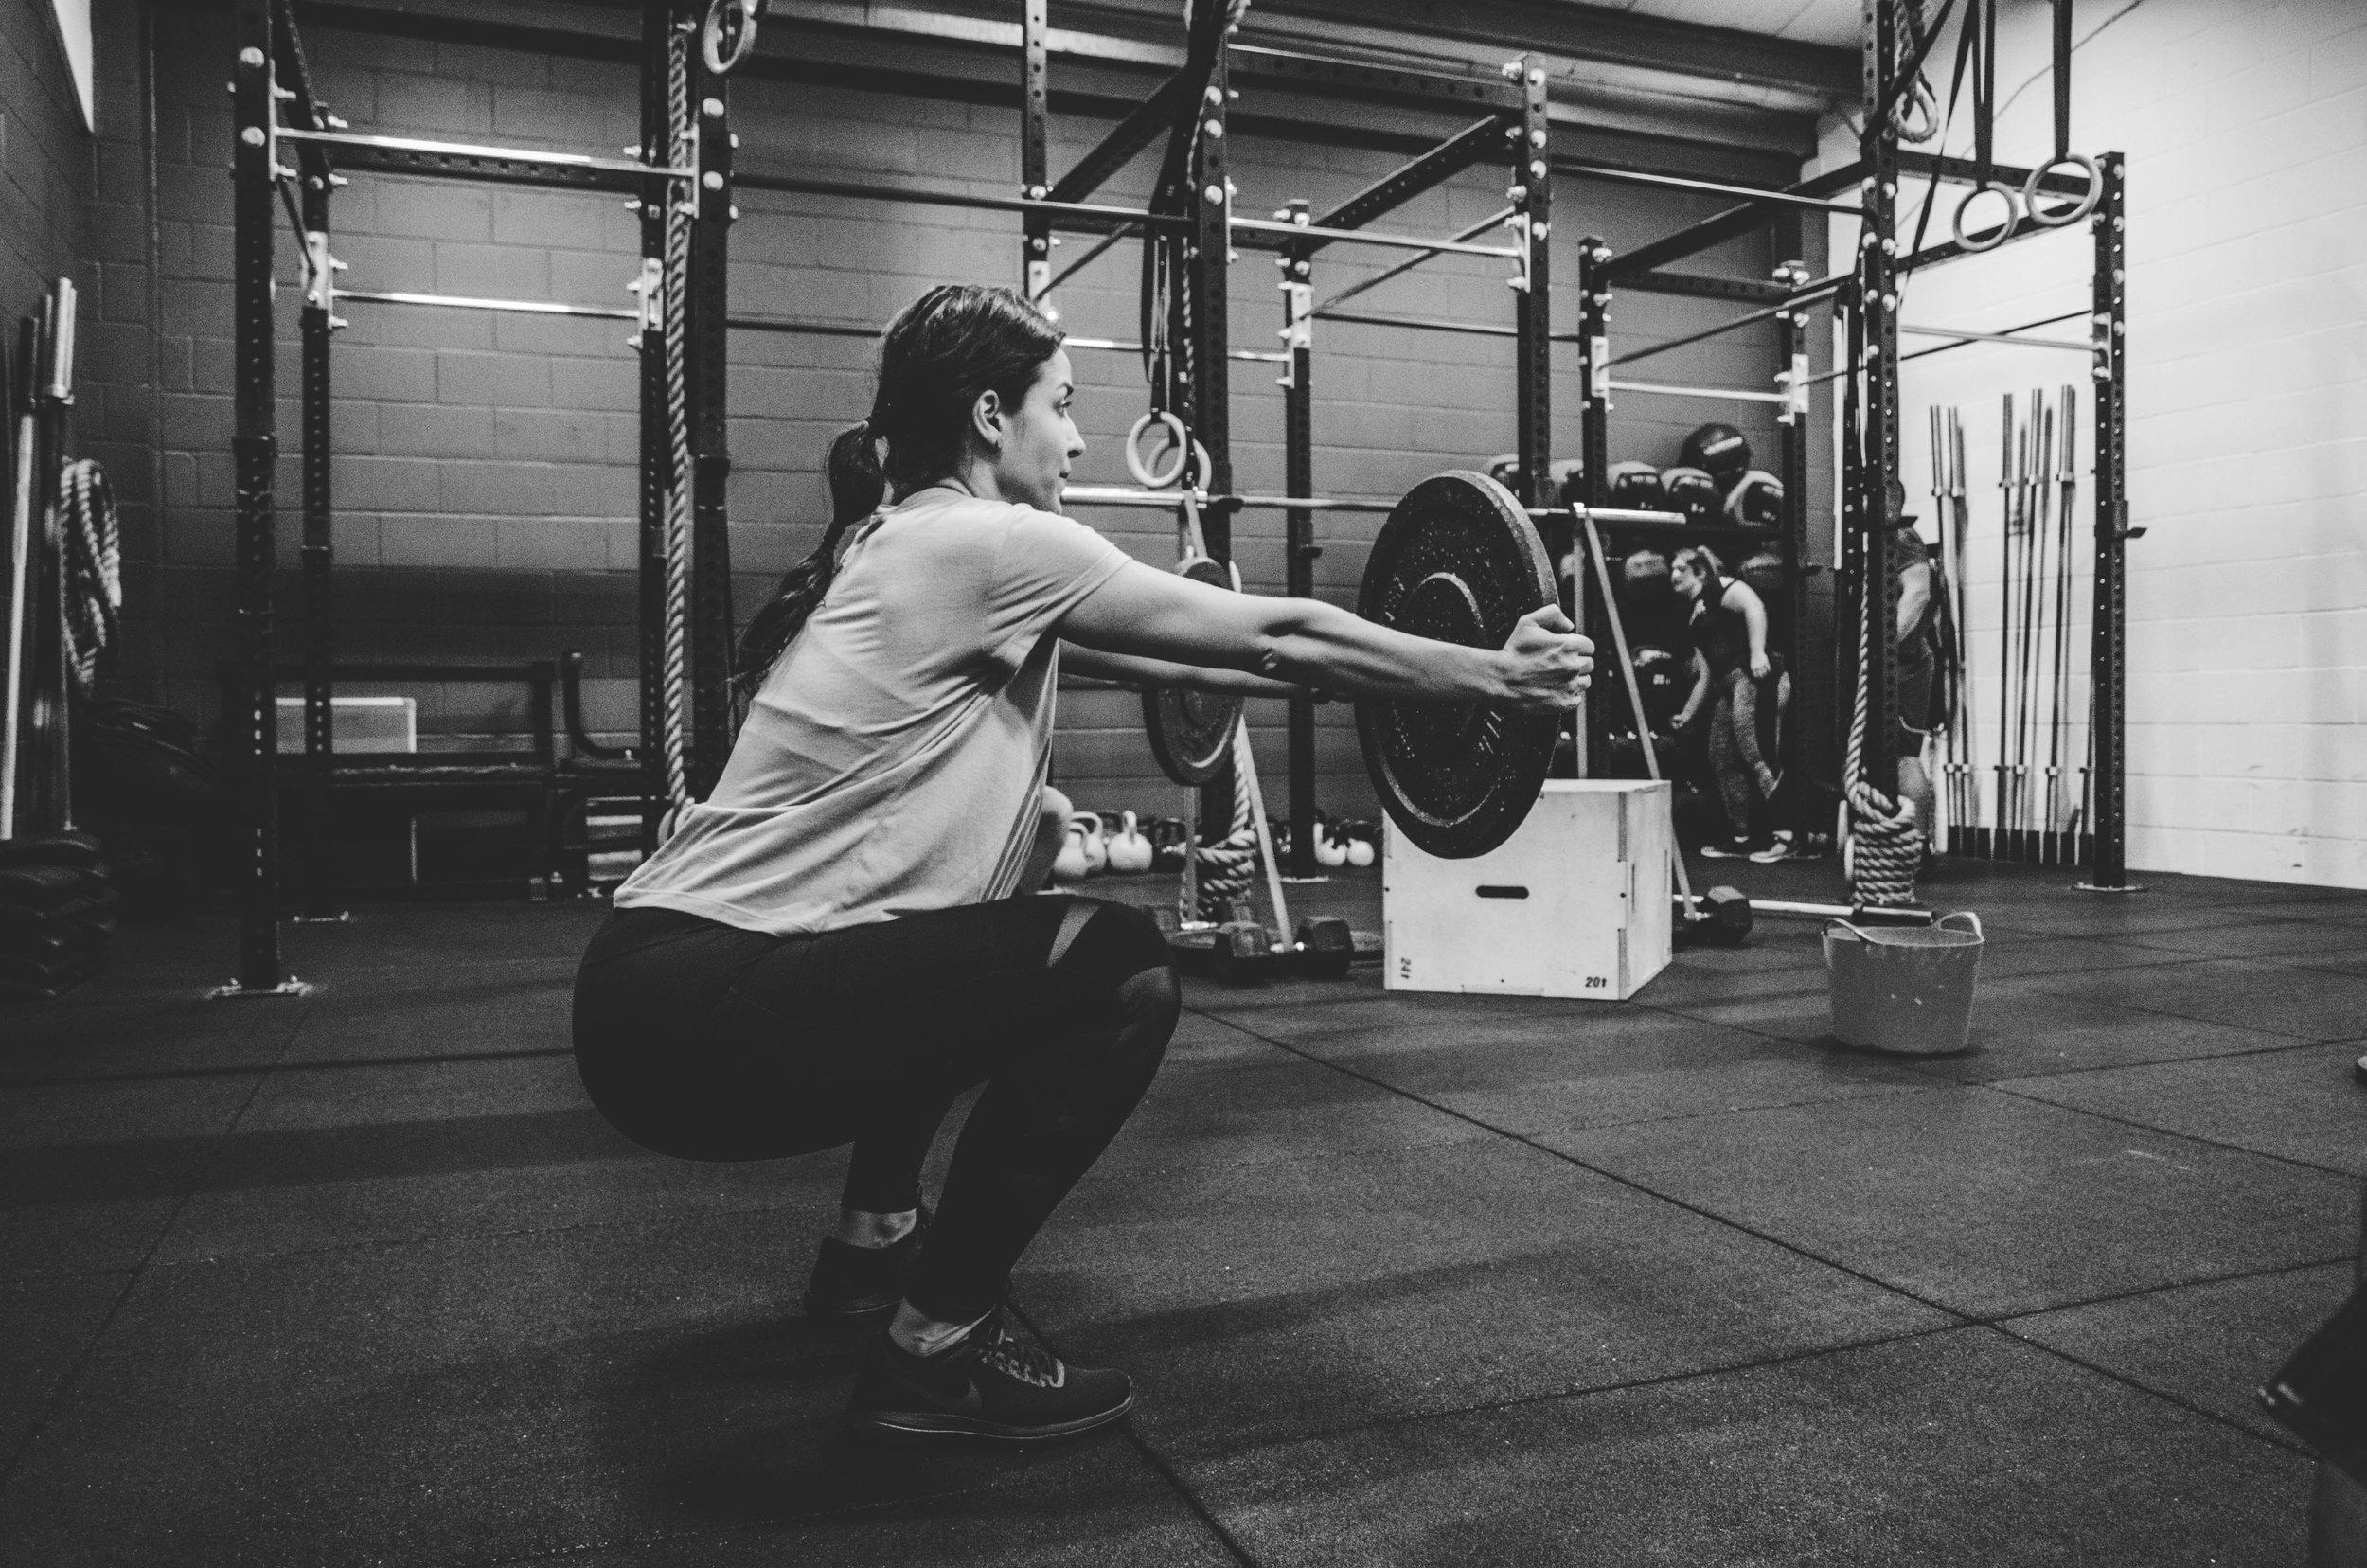 squat-crossfit.jpg